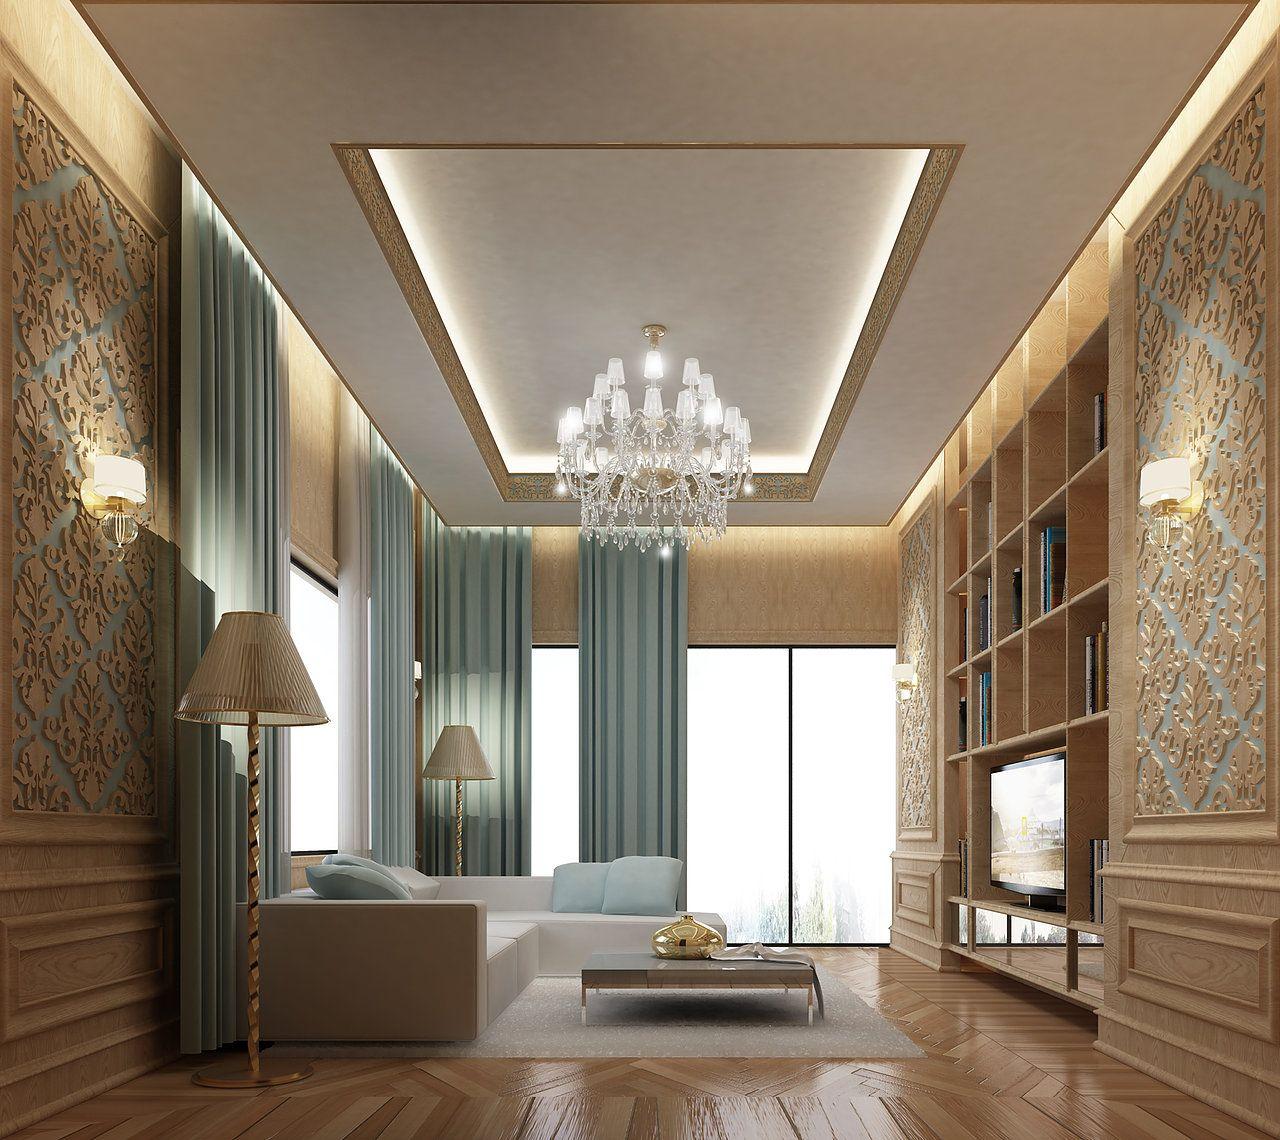 Luxury interior Design DubaiIONS one the leading interior